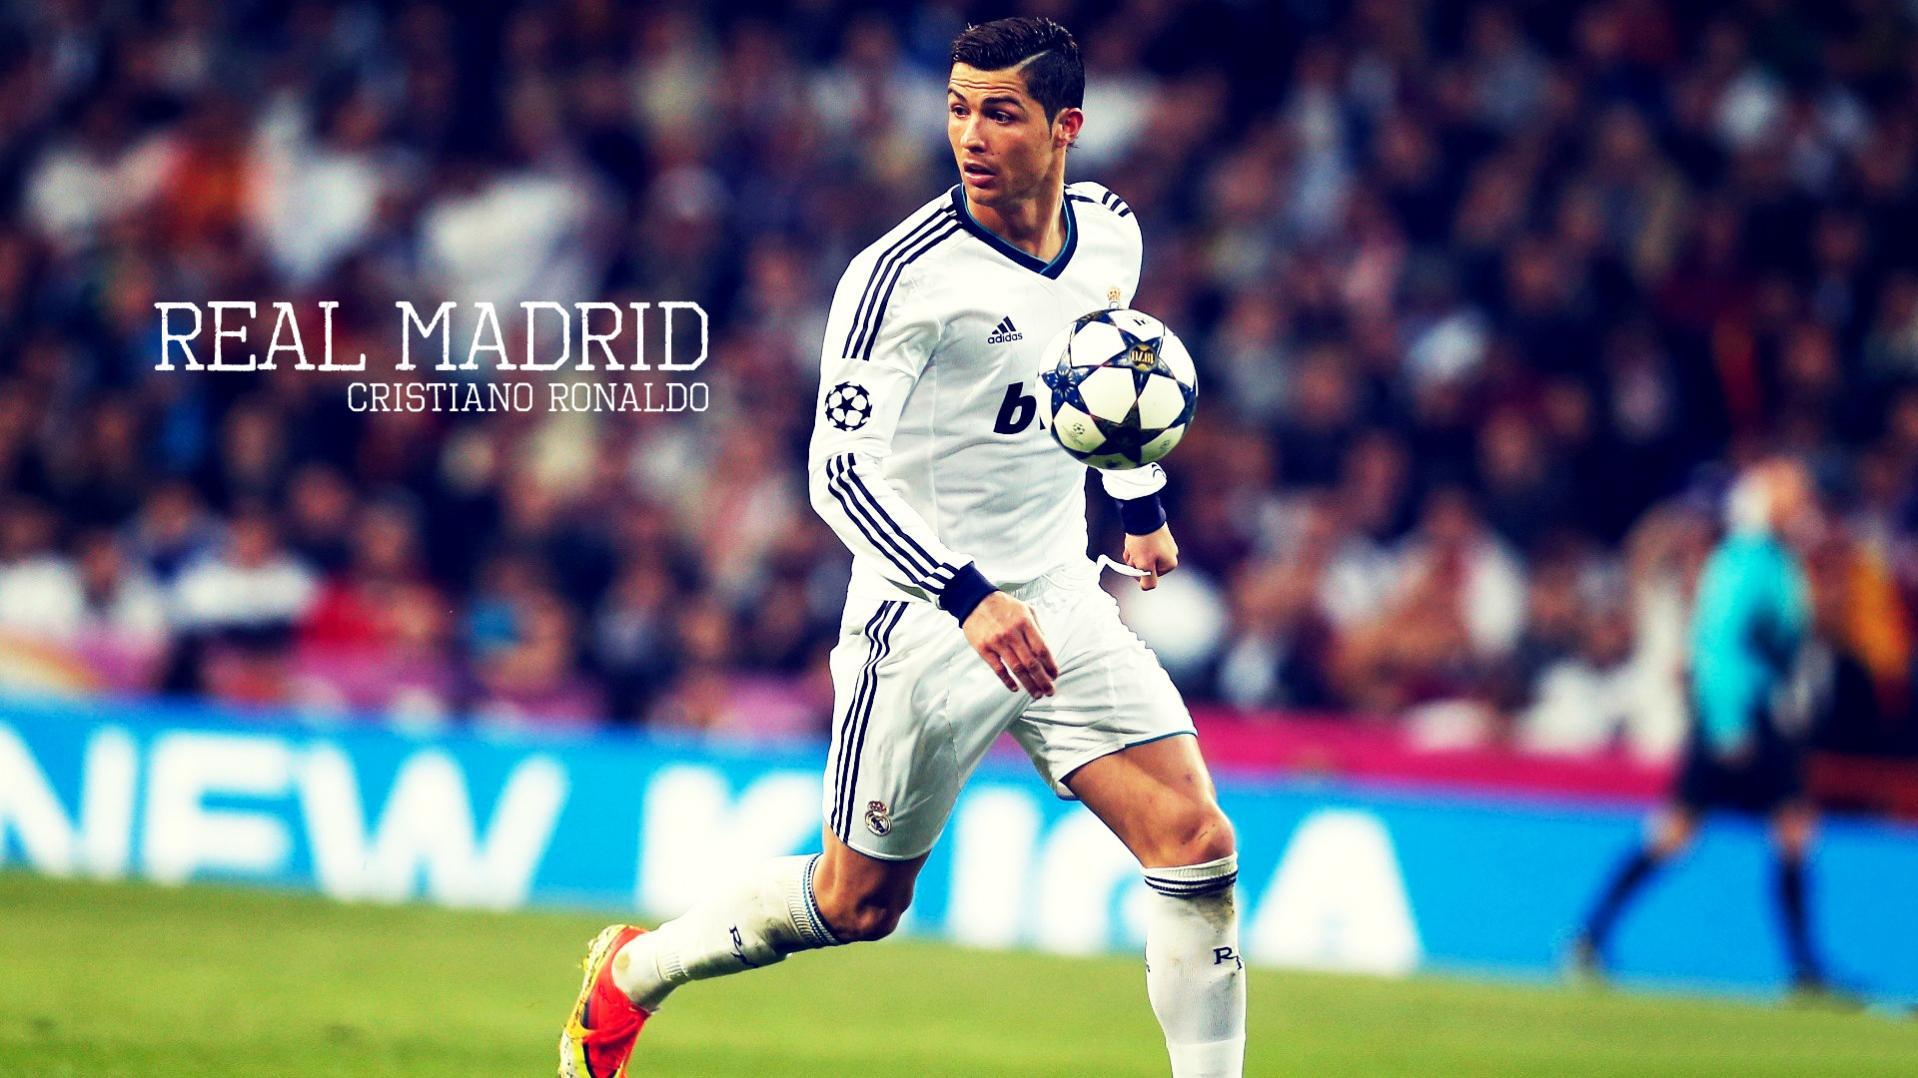 ronaldo football wallpapers hd - photo #40